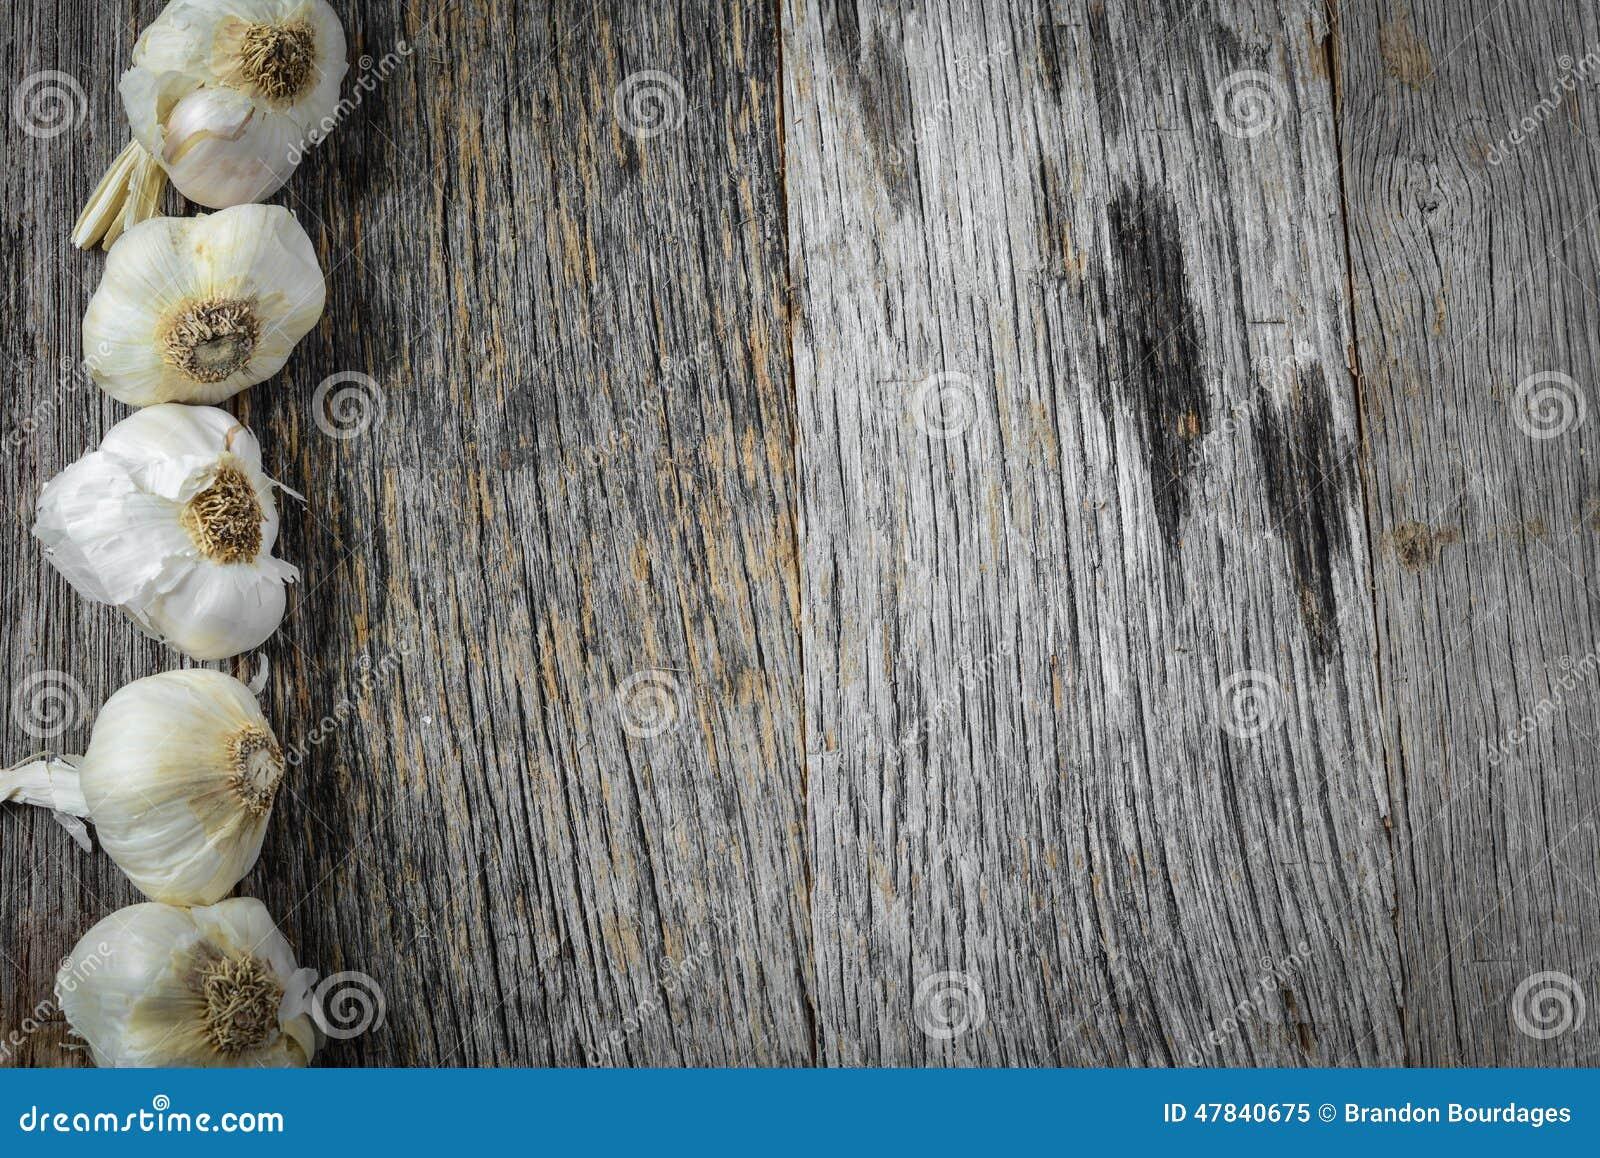 Garlic on Rustic Wood